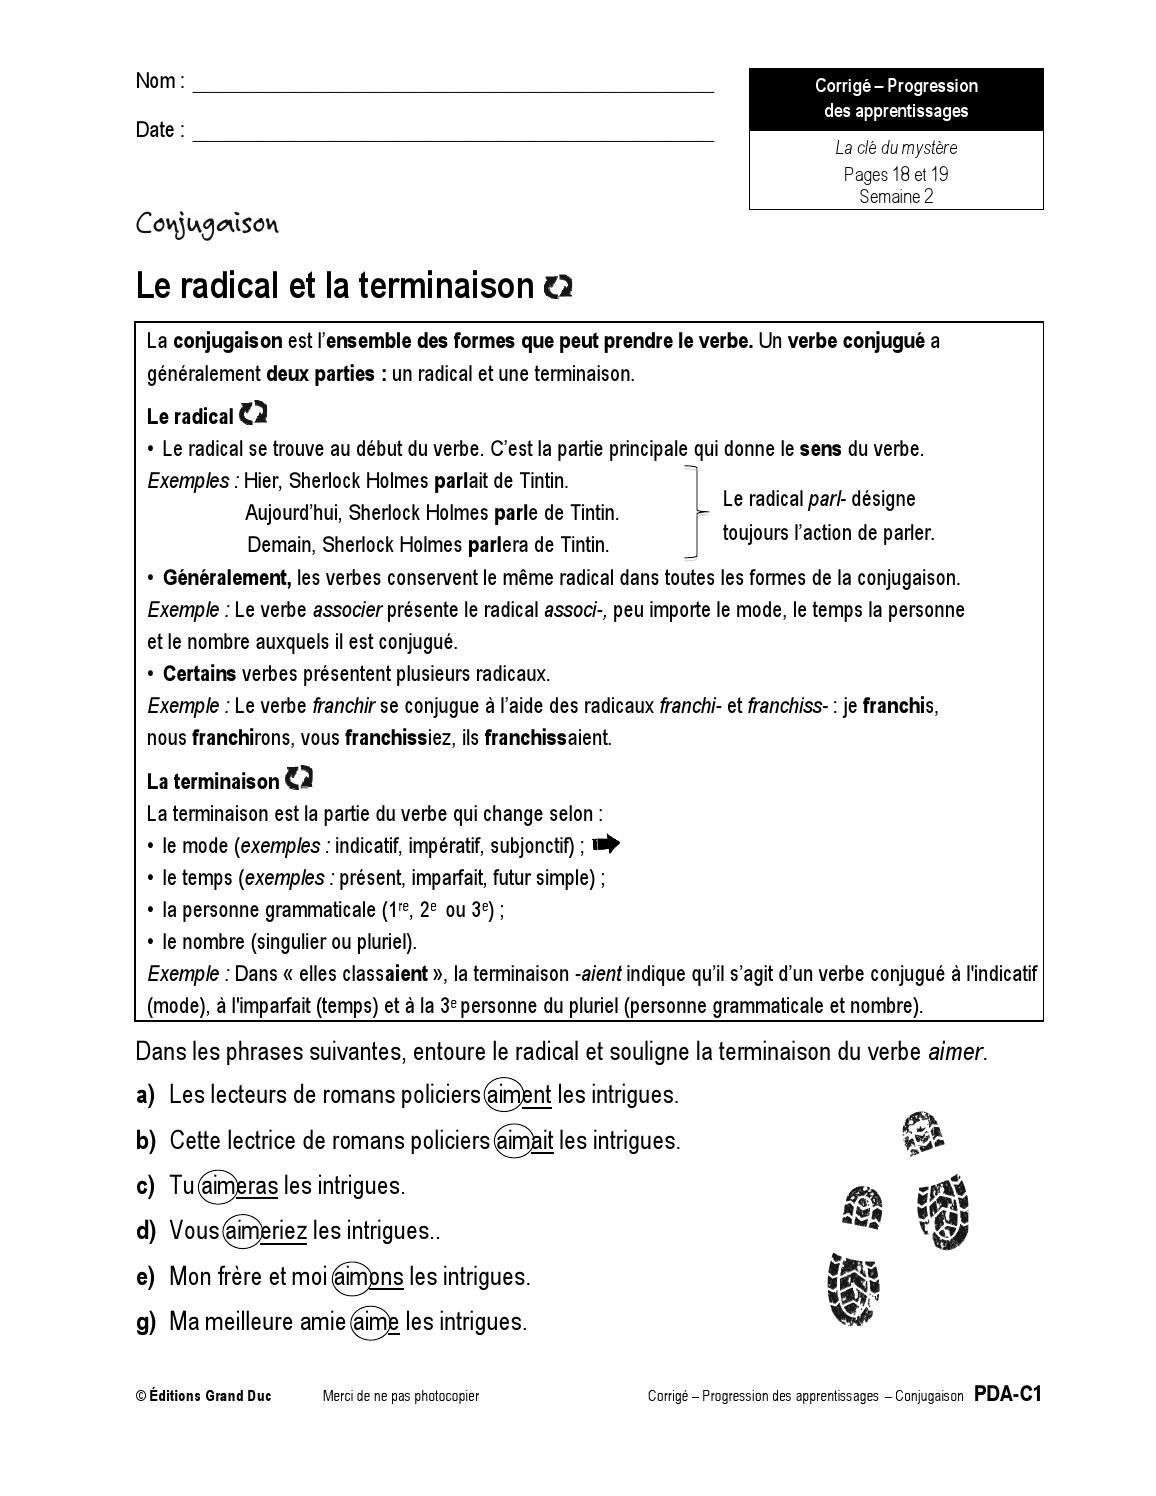 Guide Charivari Extrait 5e Annee By Editions Grand Duc Issuu